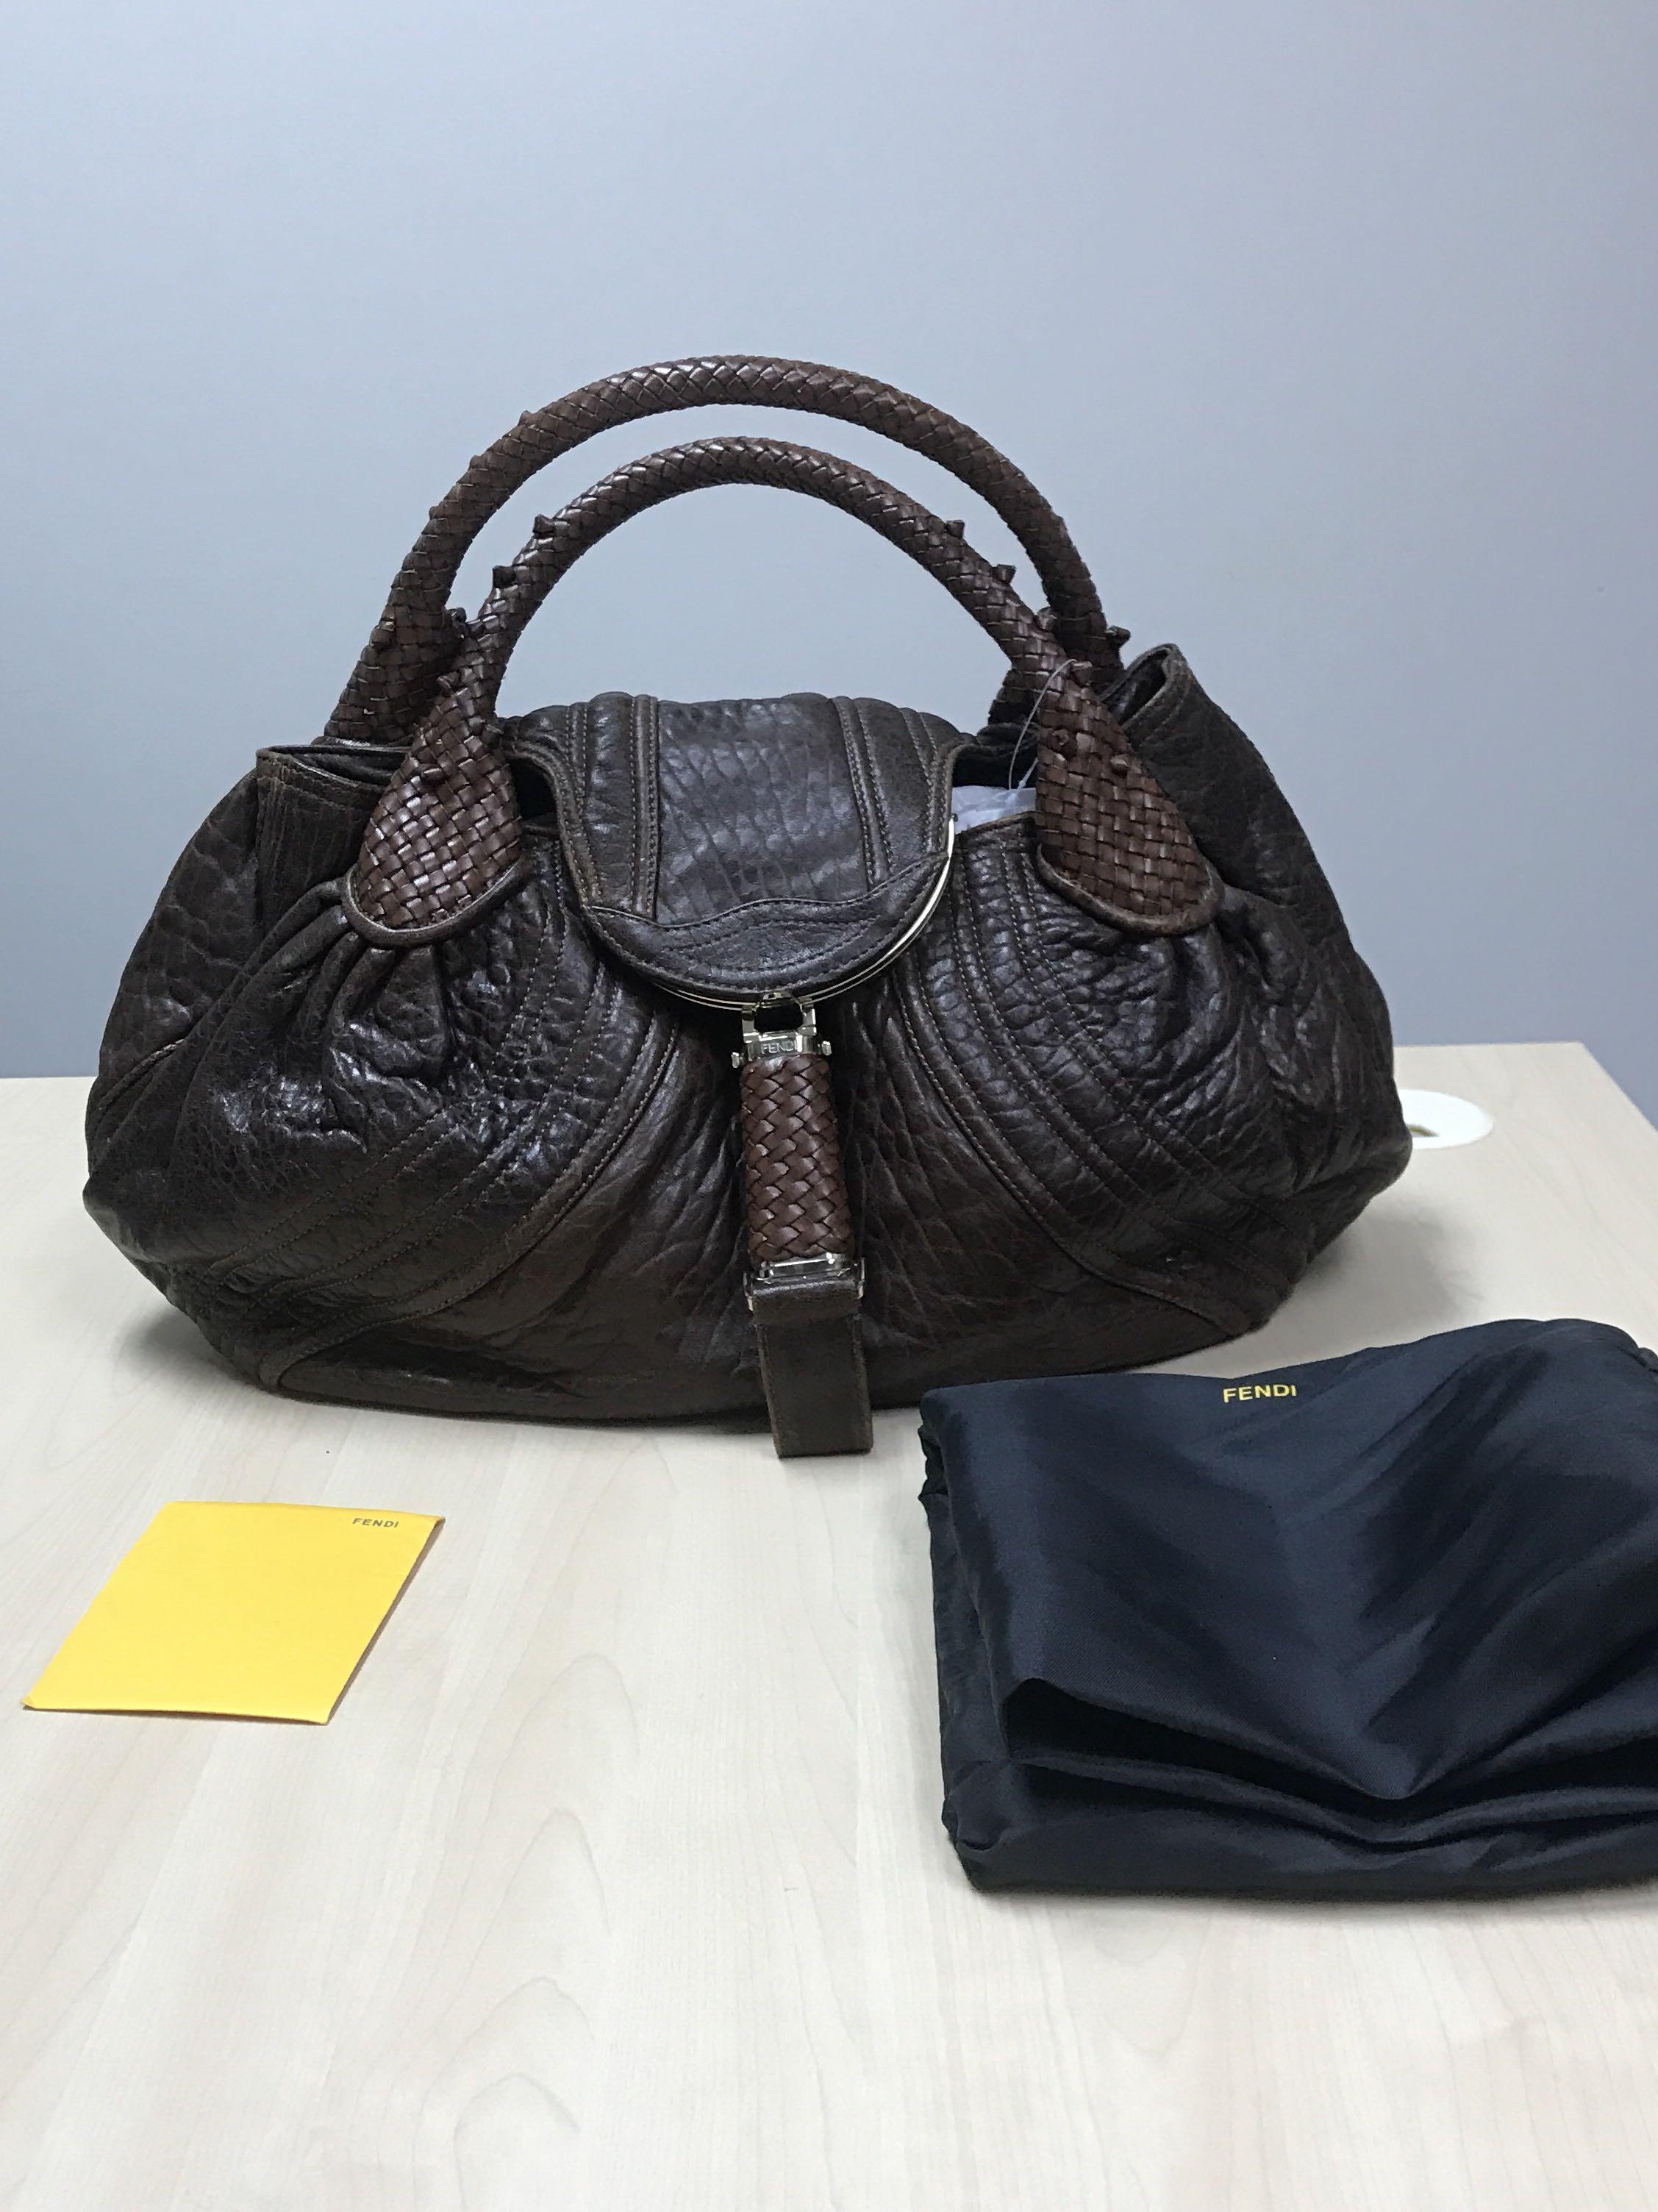 7e81d21f51d7 Fendi Spy Bag, Luxury, Bags & Wallets, Handbags on Carousell